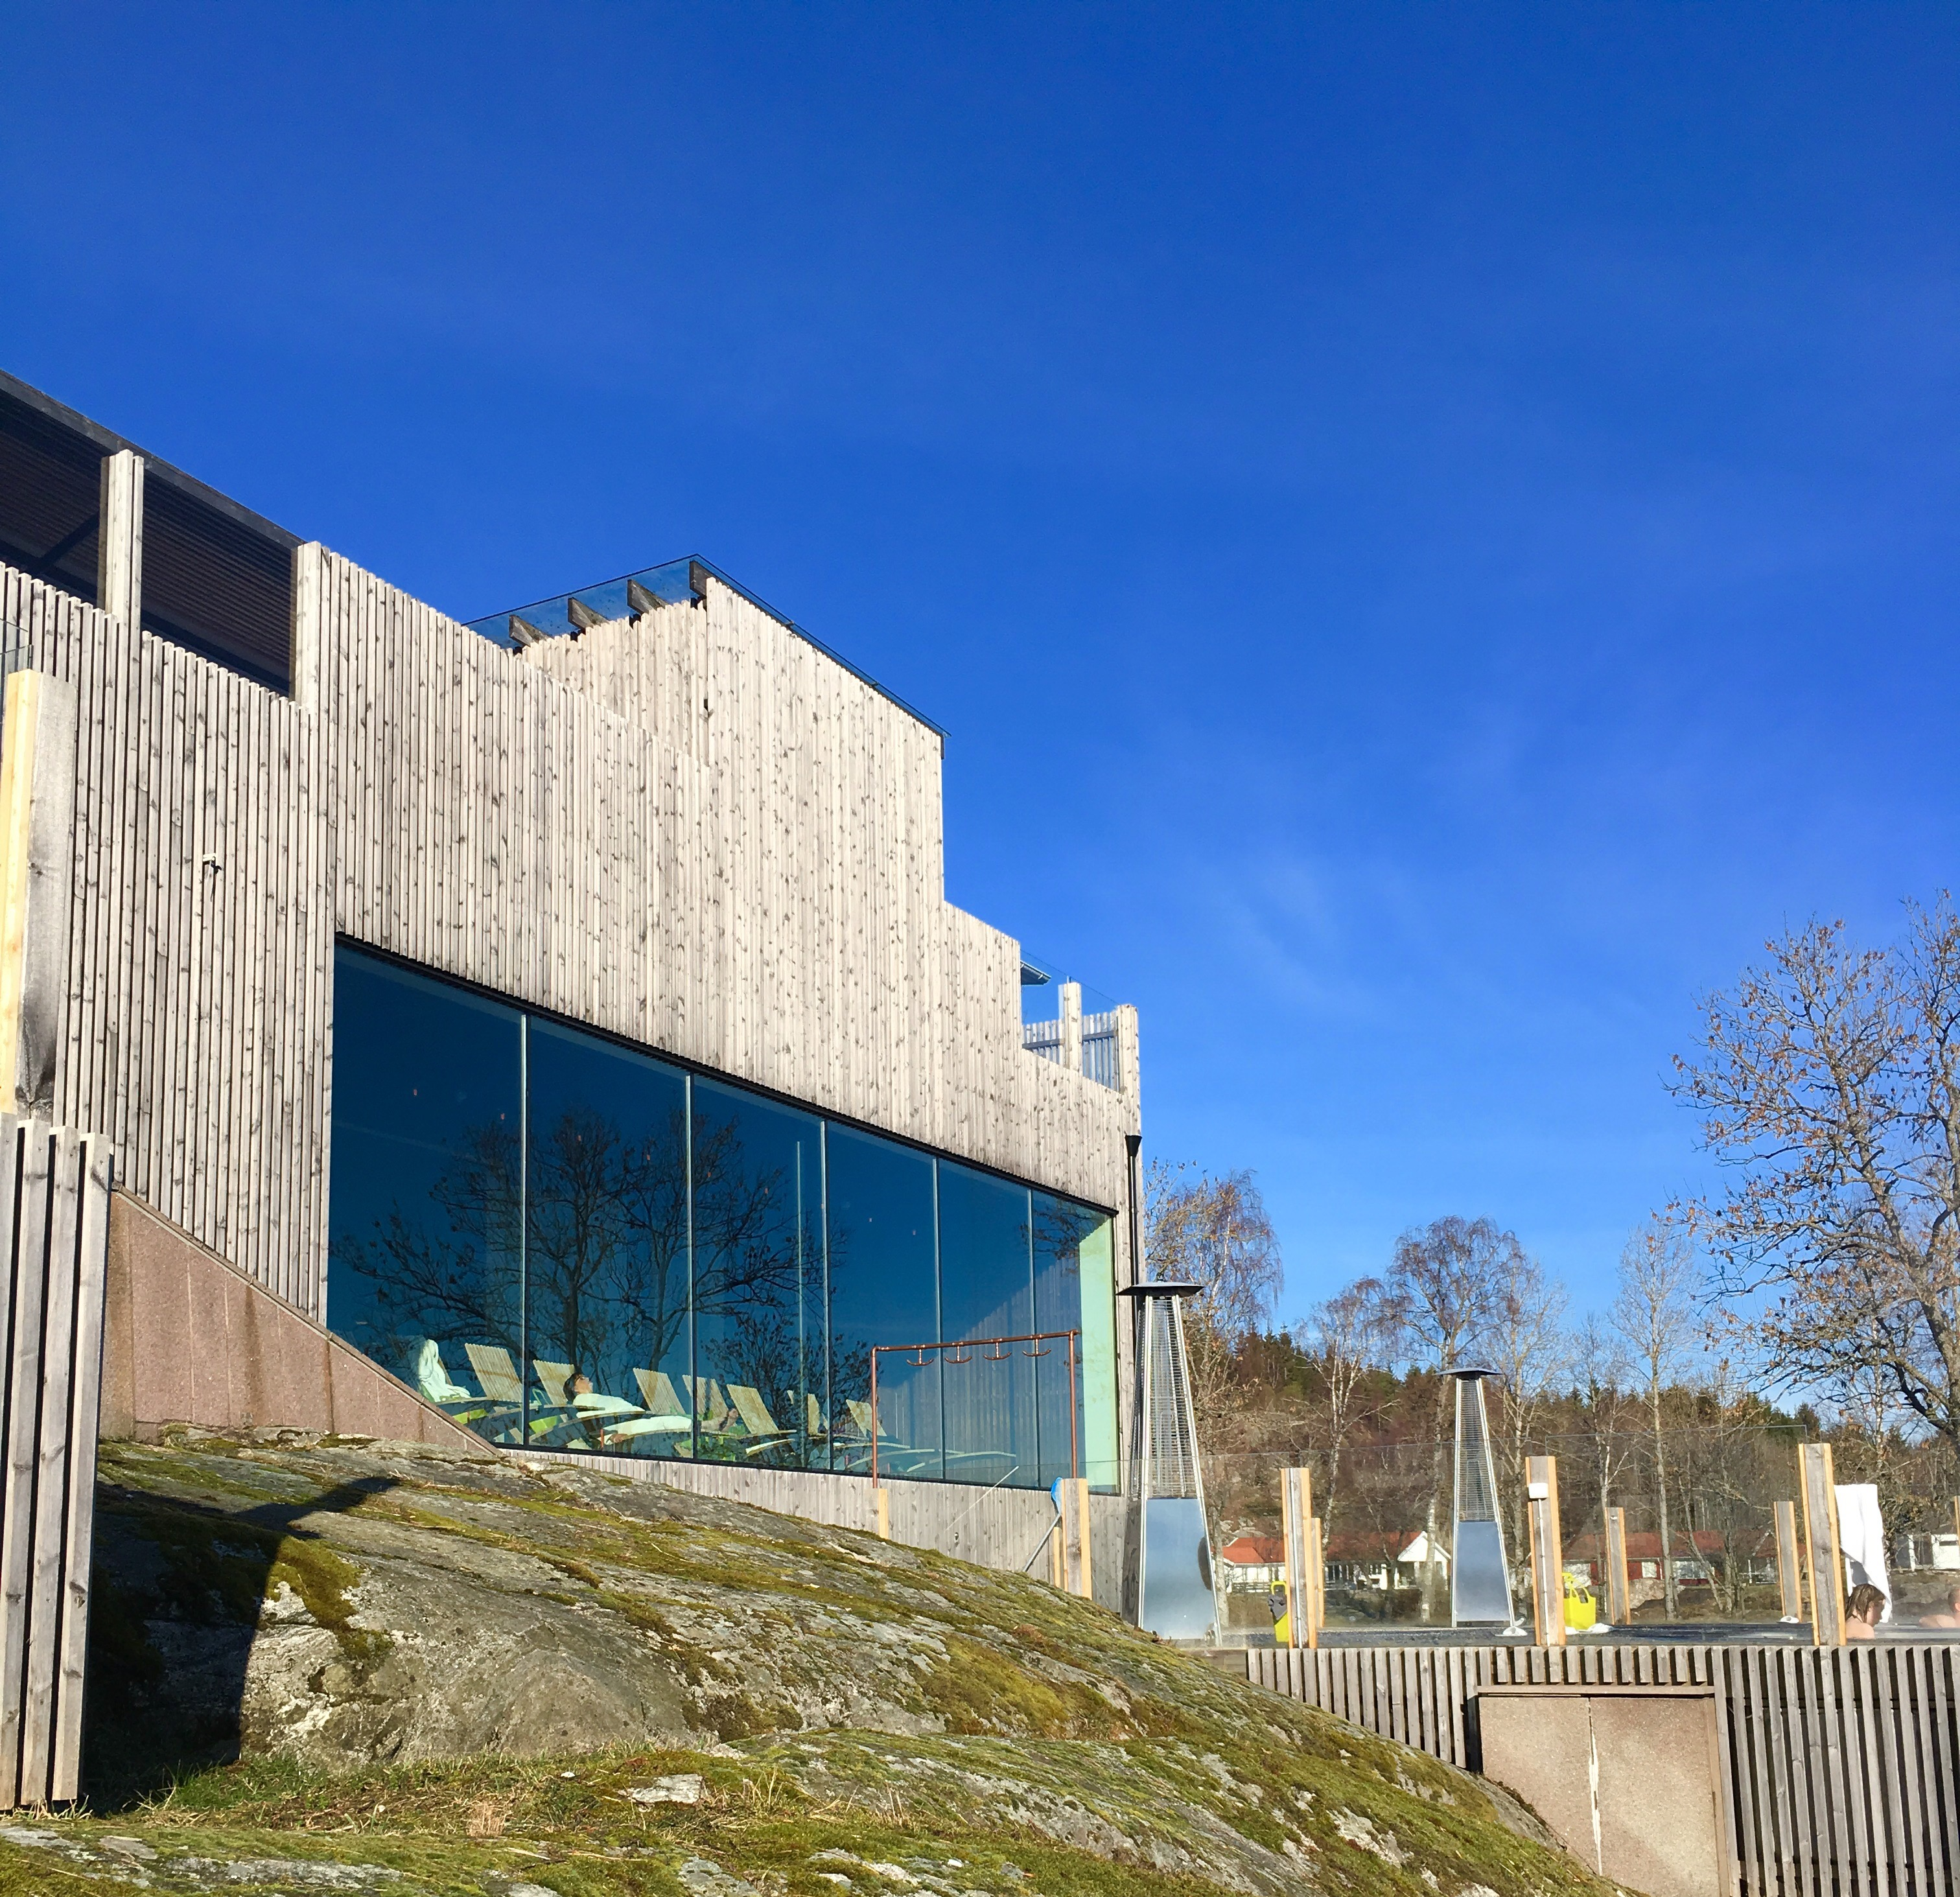 Vann Spa Lysekil Sweden